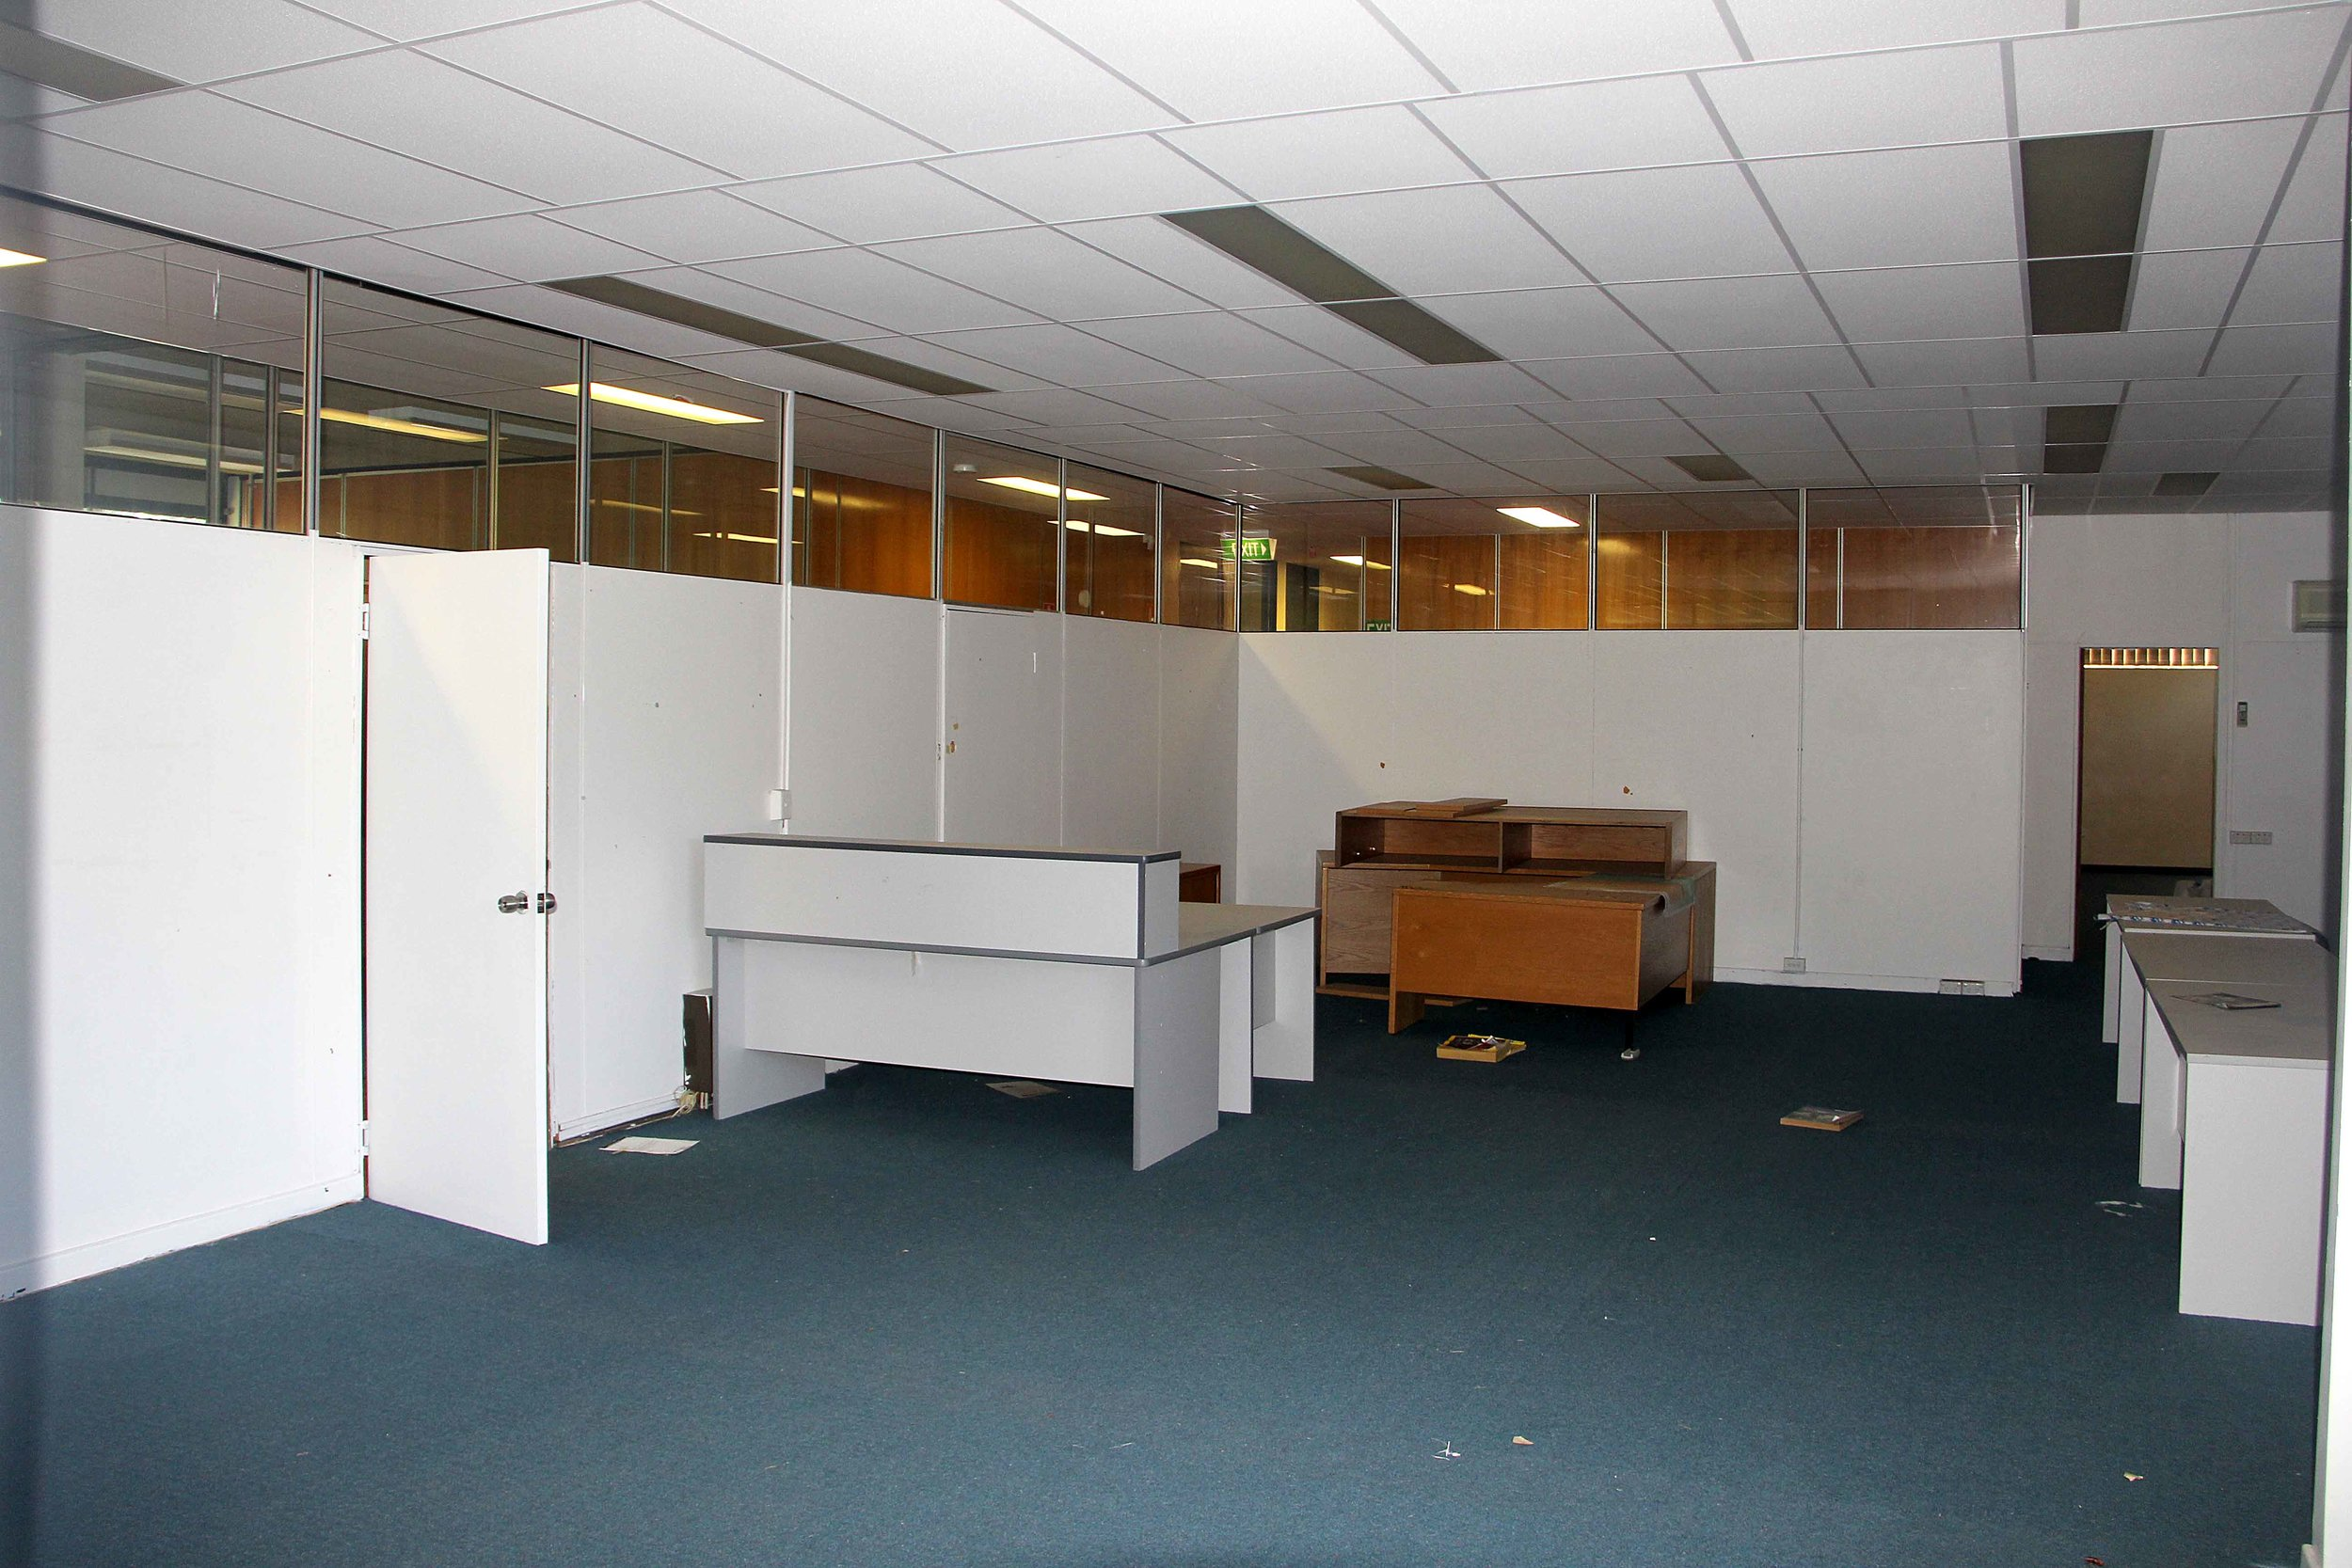 28 upstairs south office 2.jpg